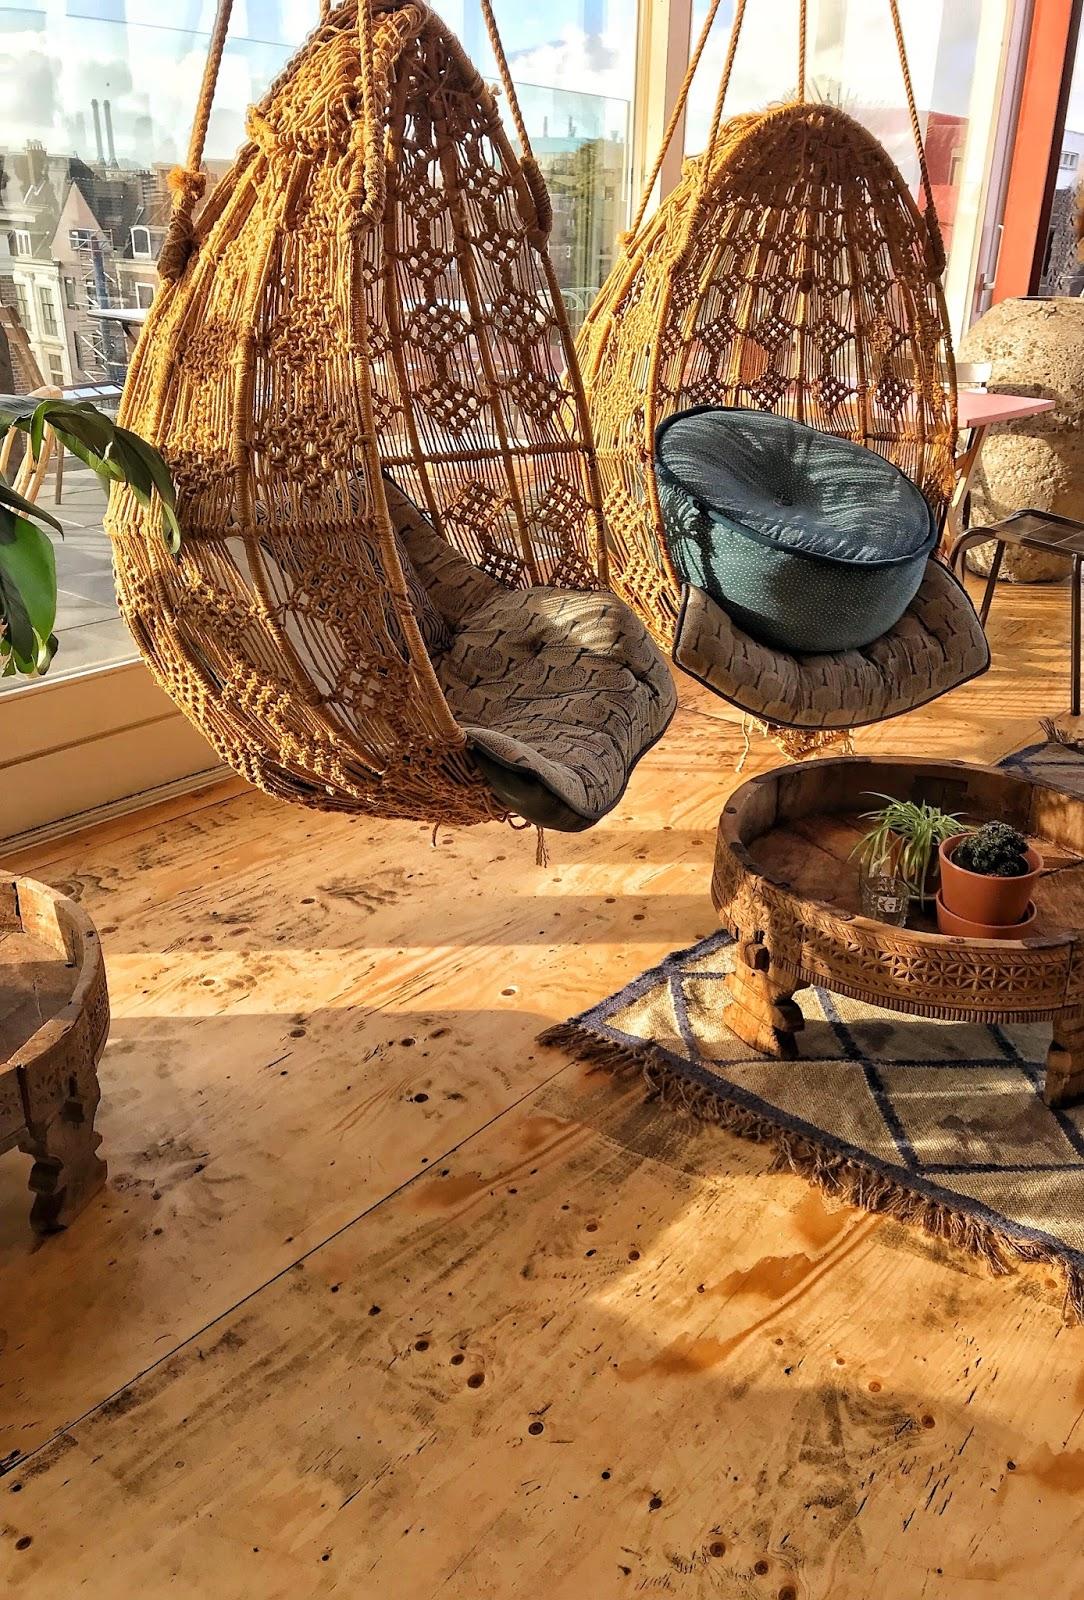 Rustic interiors at Bleyenberg Grote Markt Den Haag